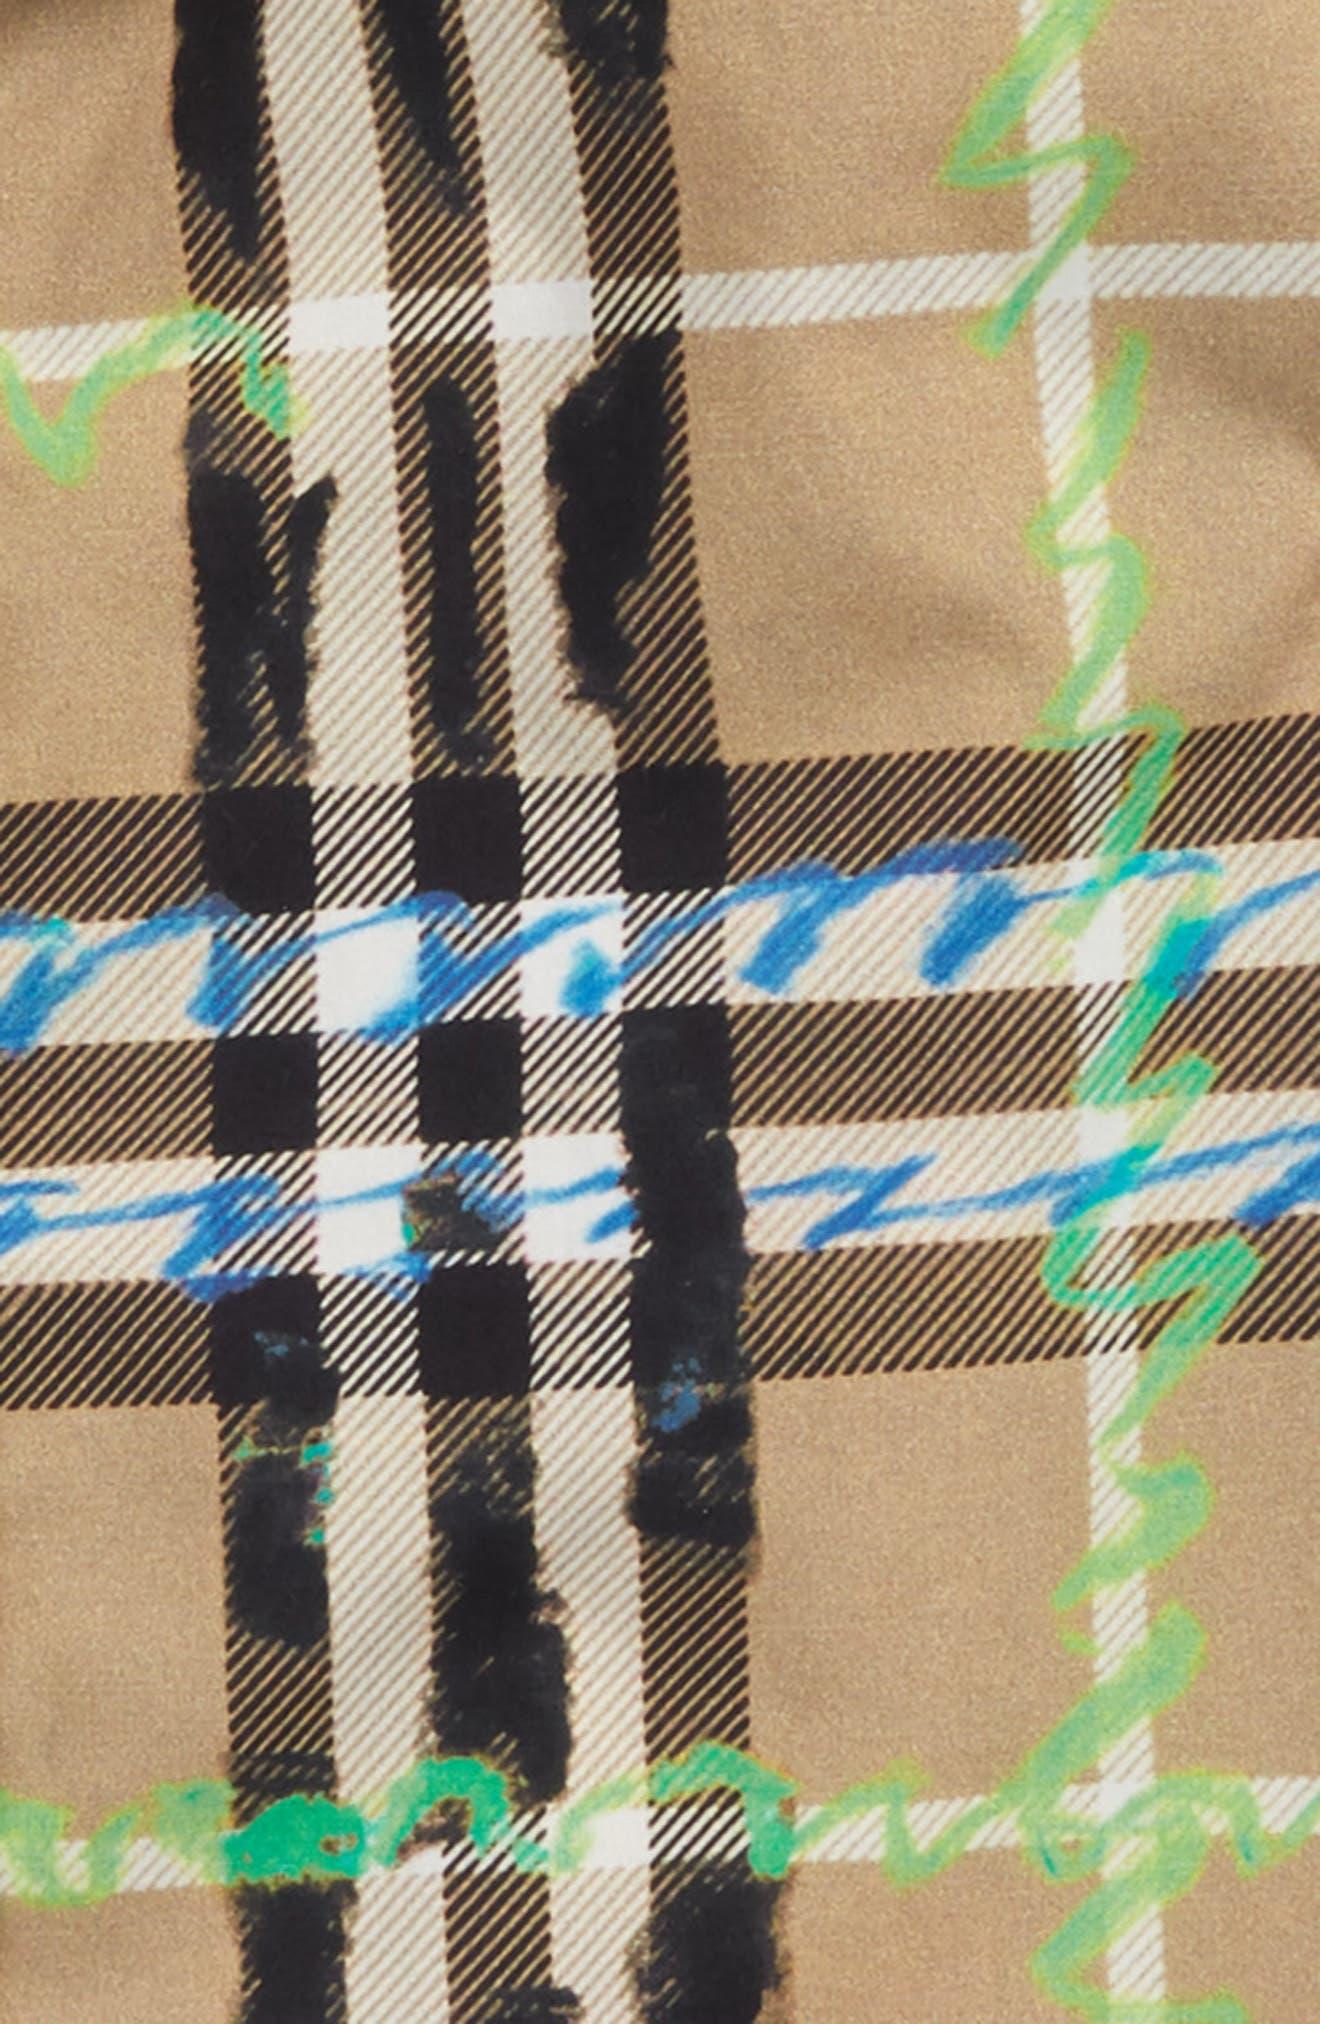 Clarkey Scribble Plaid Woven Shirt,                             Alternate thumbnail 2, color,                             431